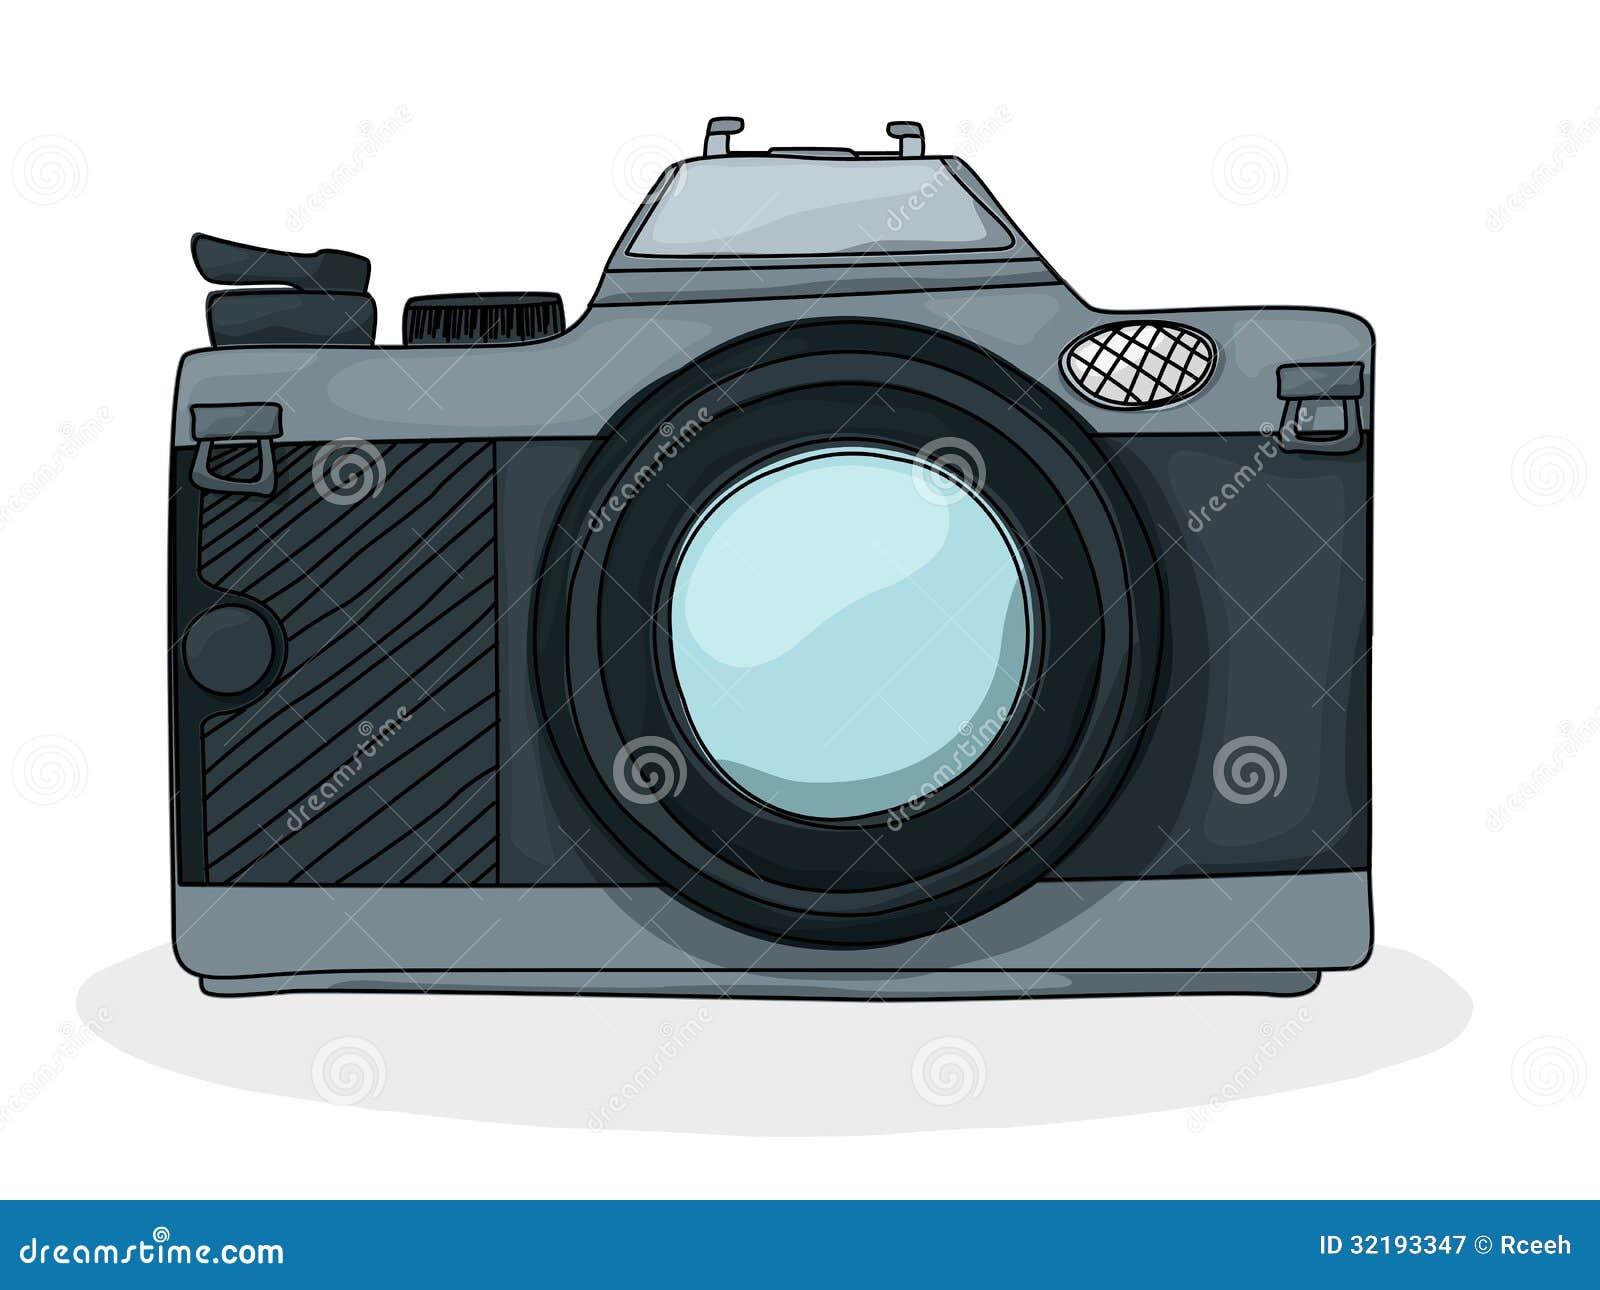 Cartoon Camera Stock Vector - Image: 41889249